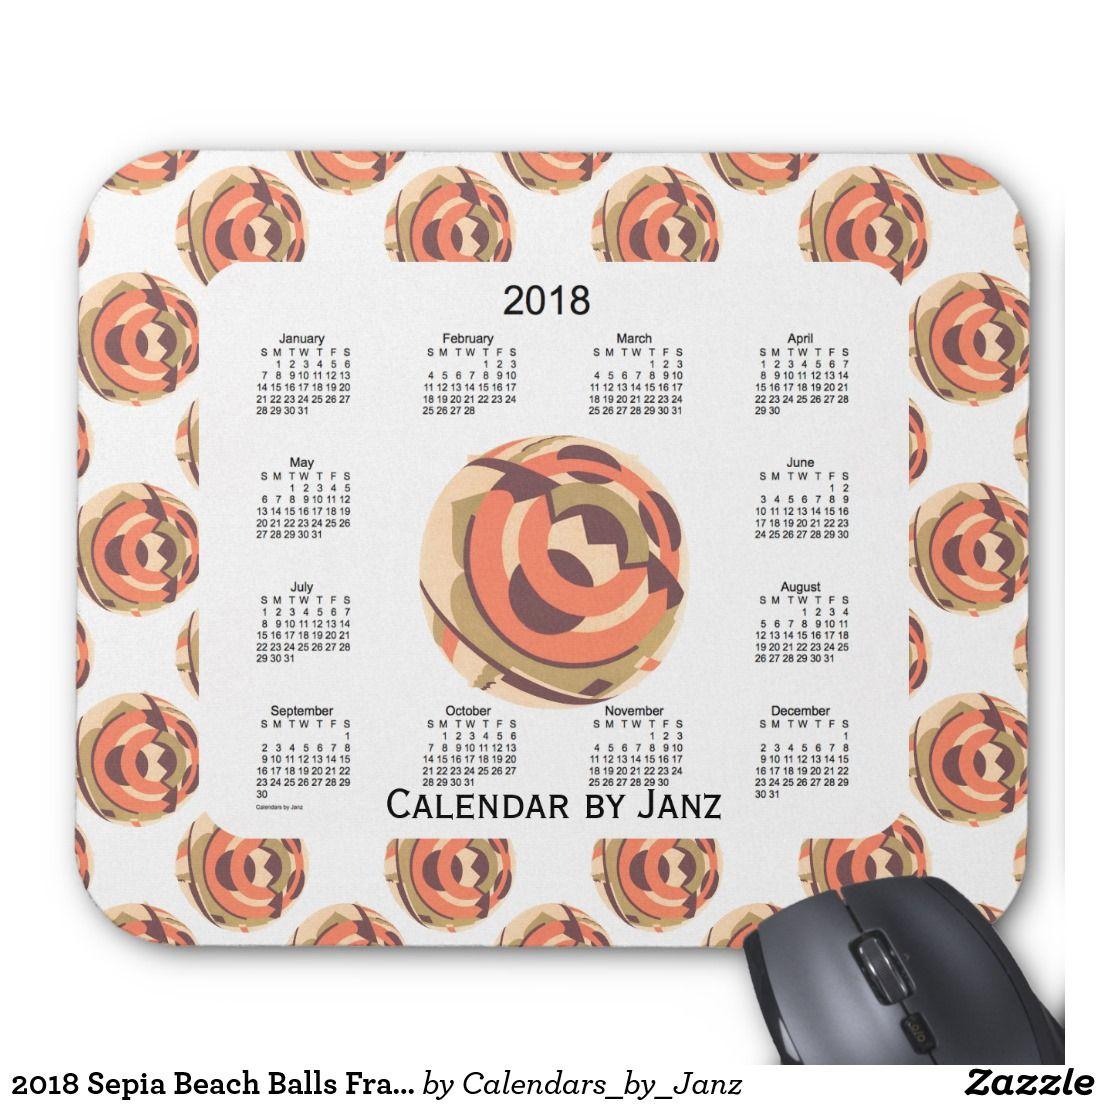 2018 Sepia Beach Balls Framed Calendar by Janz Mouse Pad ...